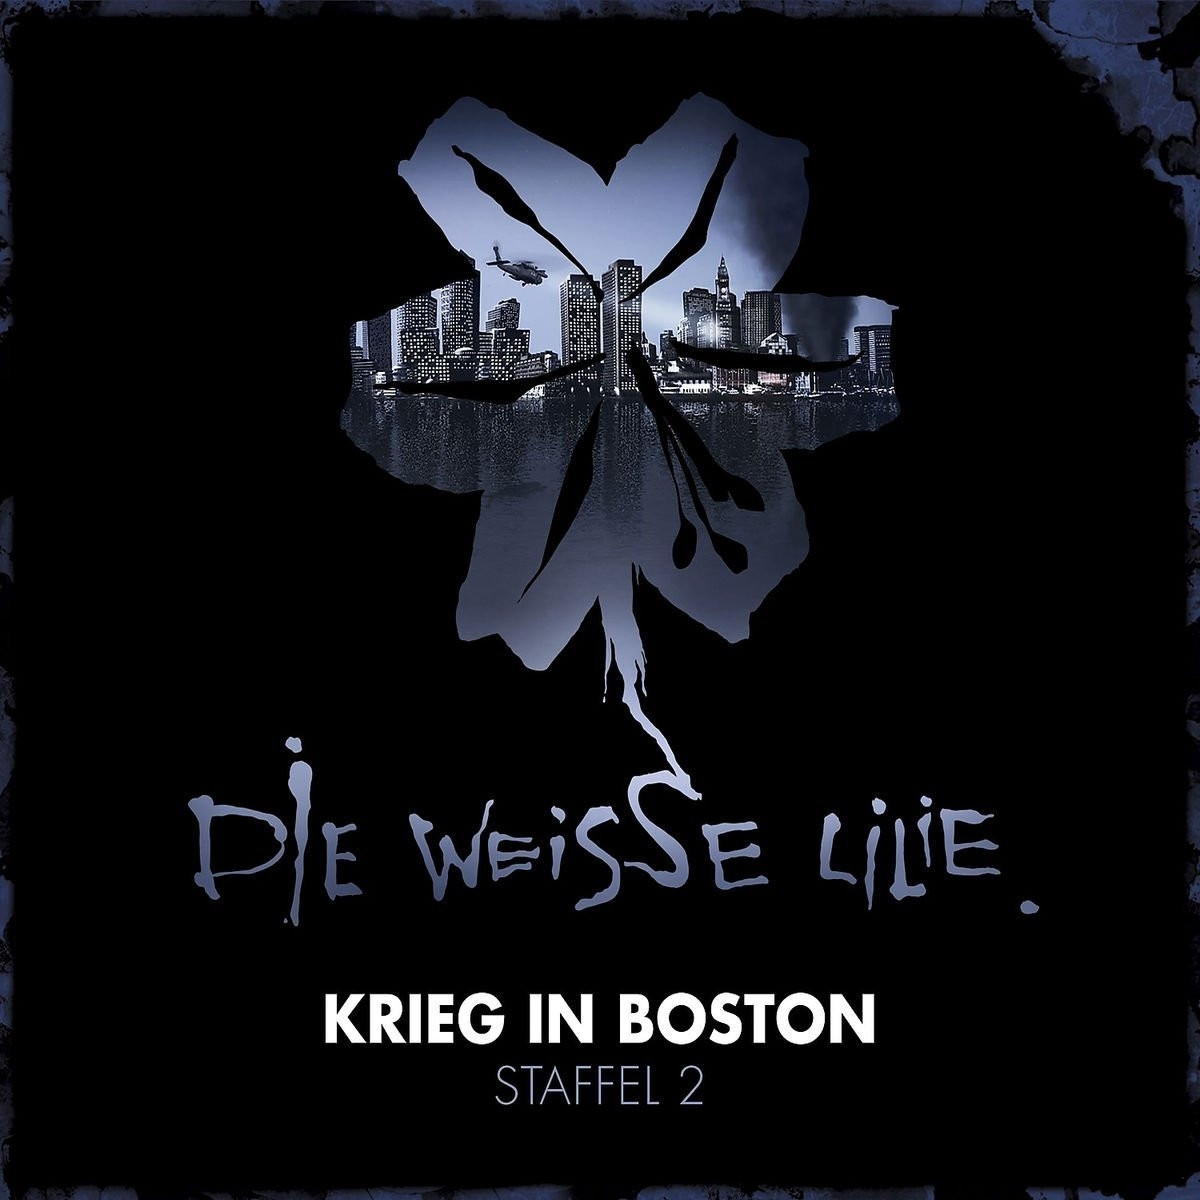 Die Weisse Lilie - Staffel 2: Krieg in Boston (3-CD Box)